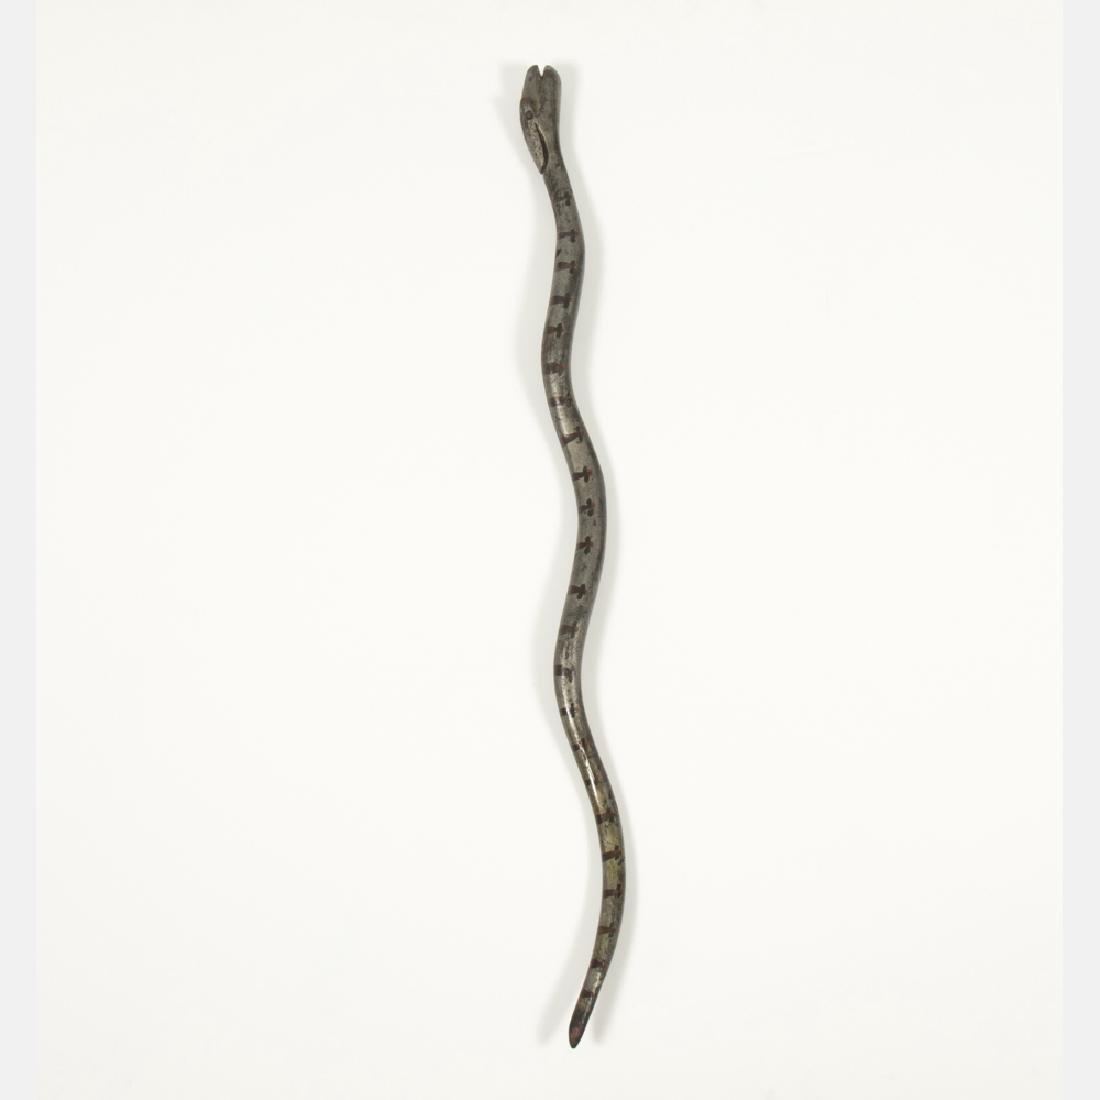 A Folk Art Carved and Painted Hardwood Snake Form Cane,